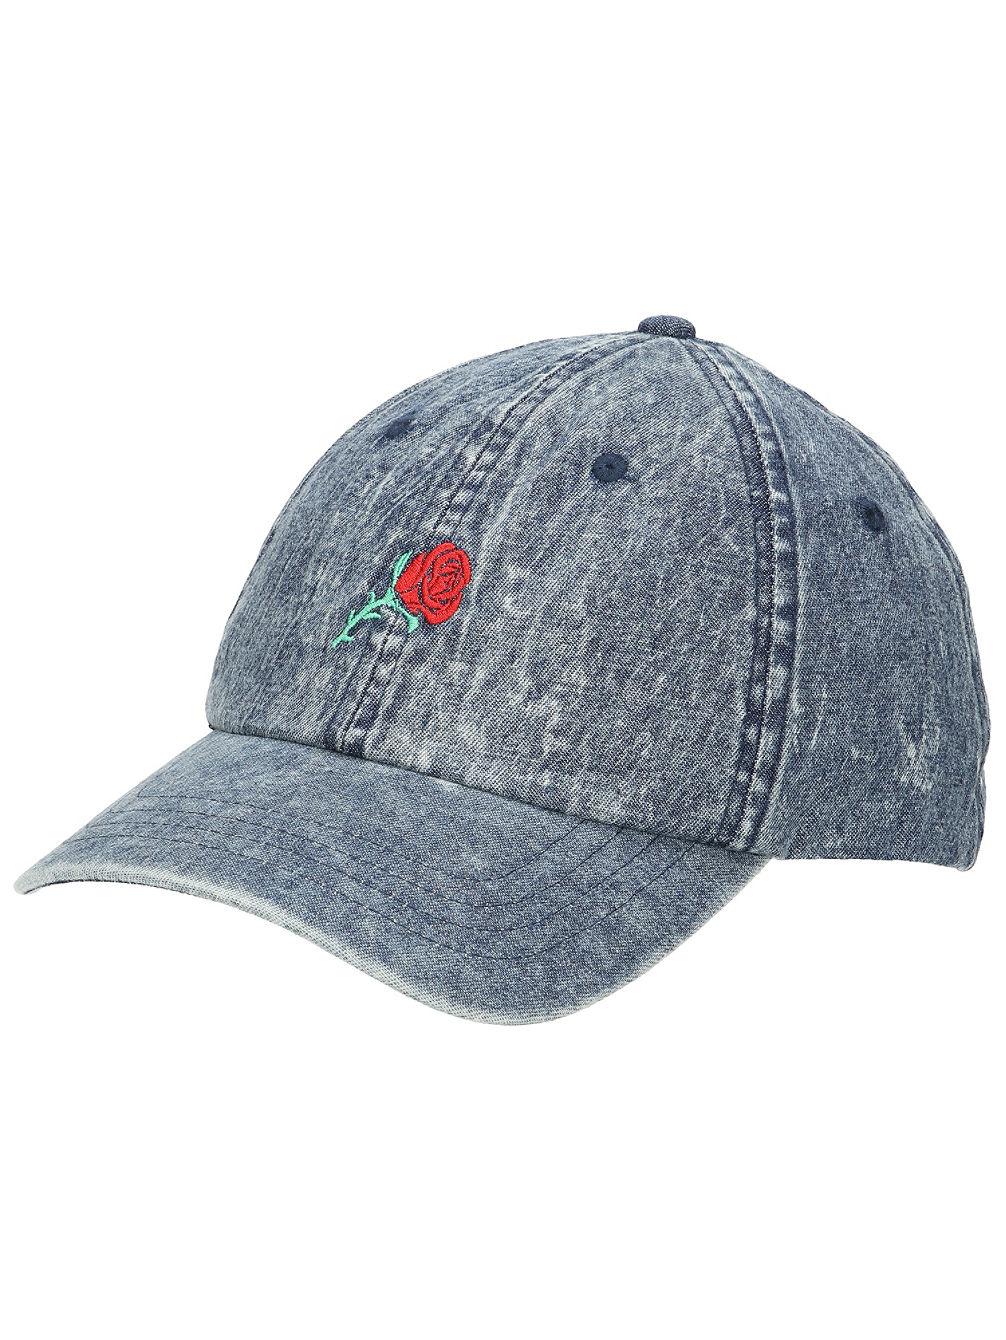 aebdb99a468 Buy Empyre Fleur Denim Dad Cap online at Blue Tomato